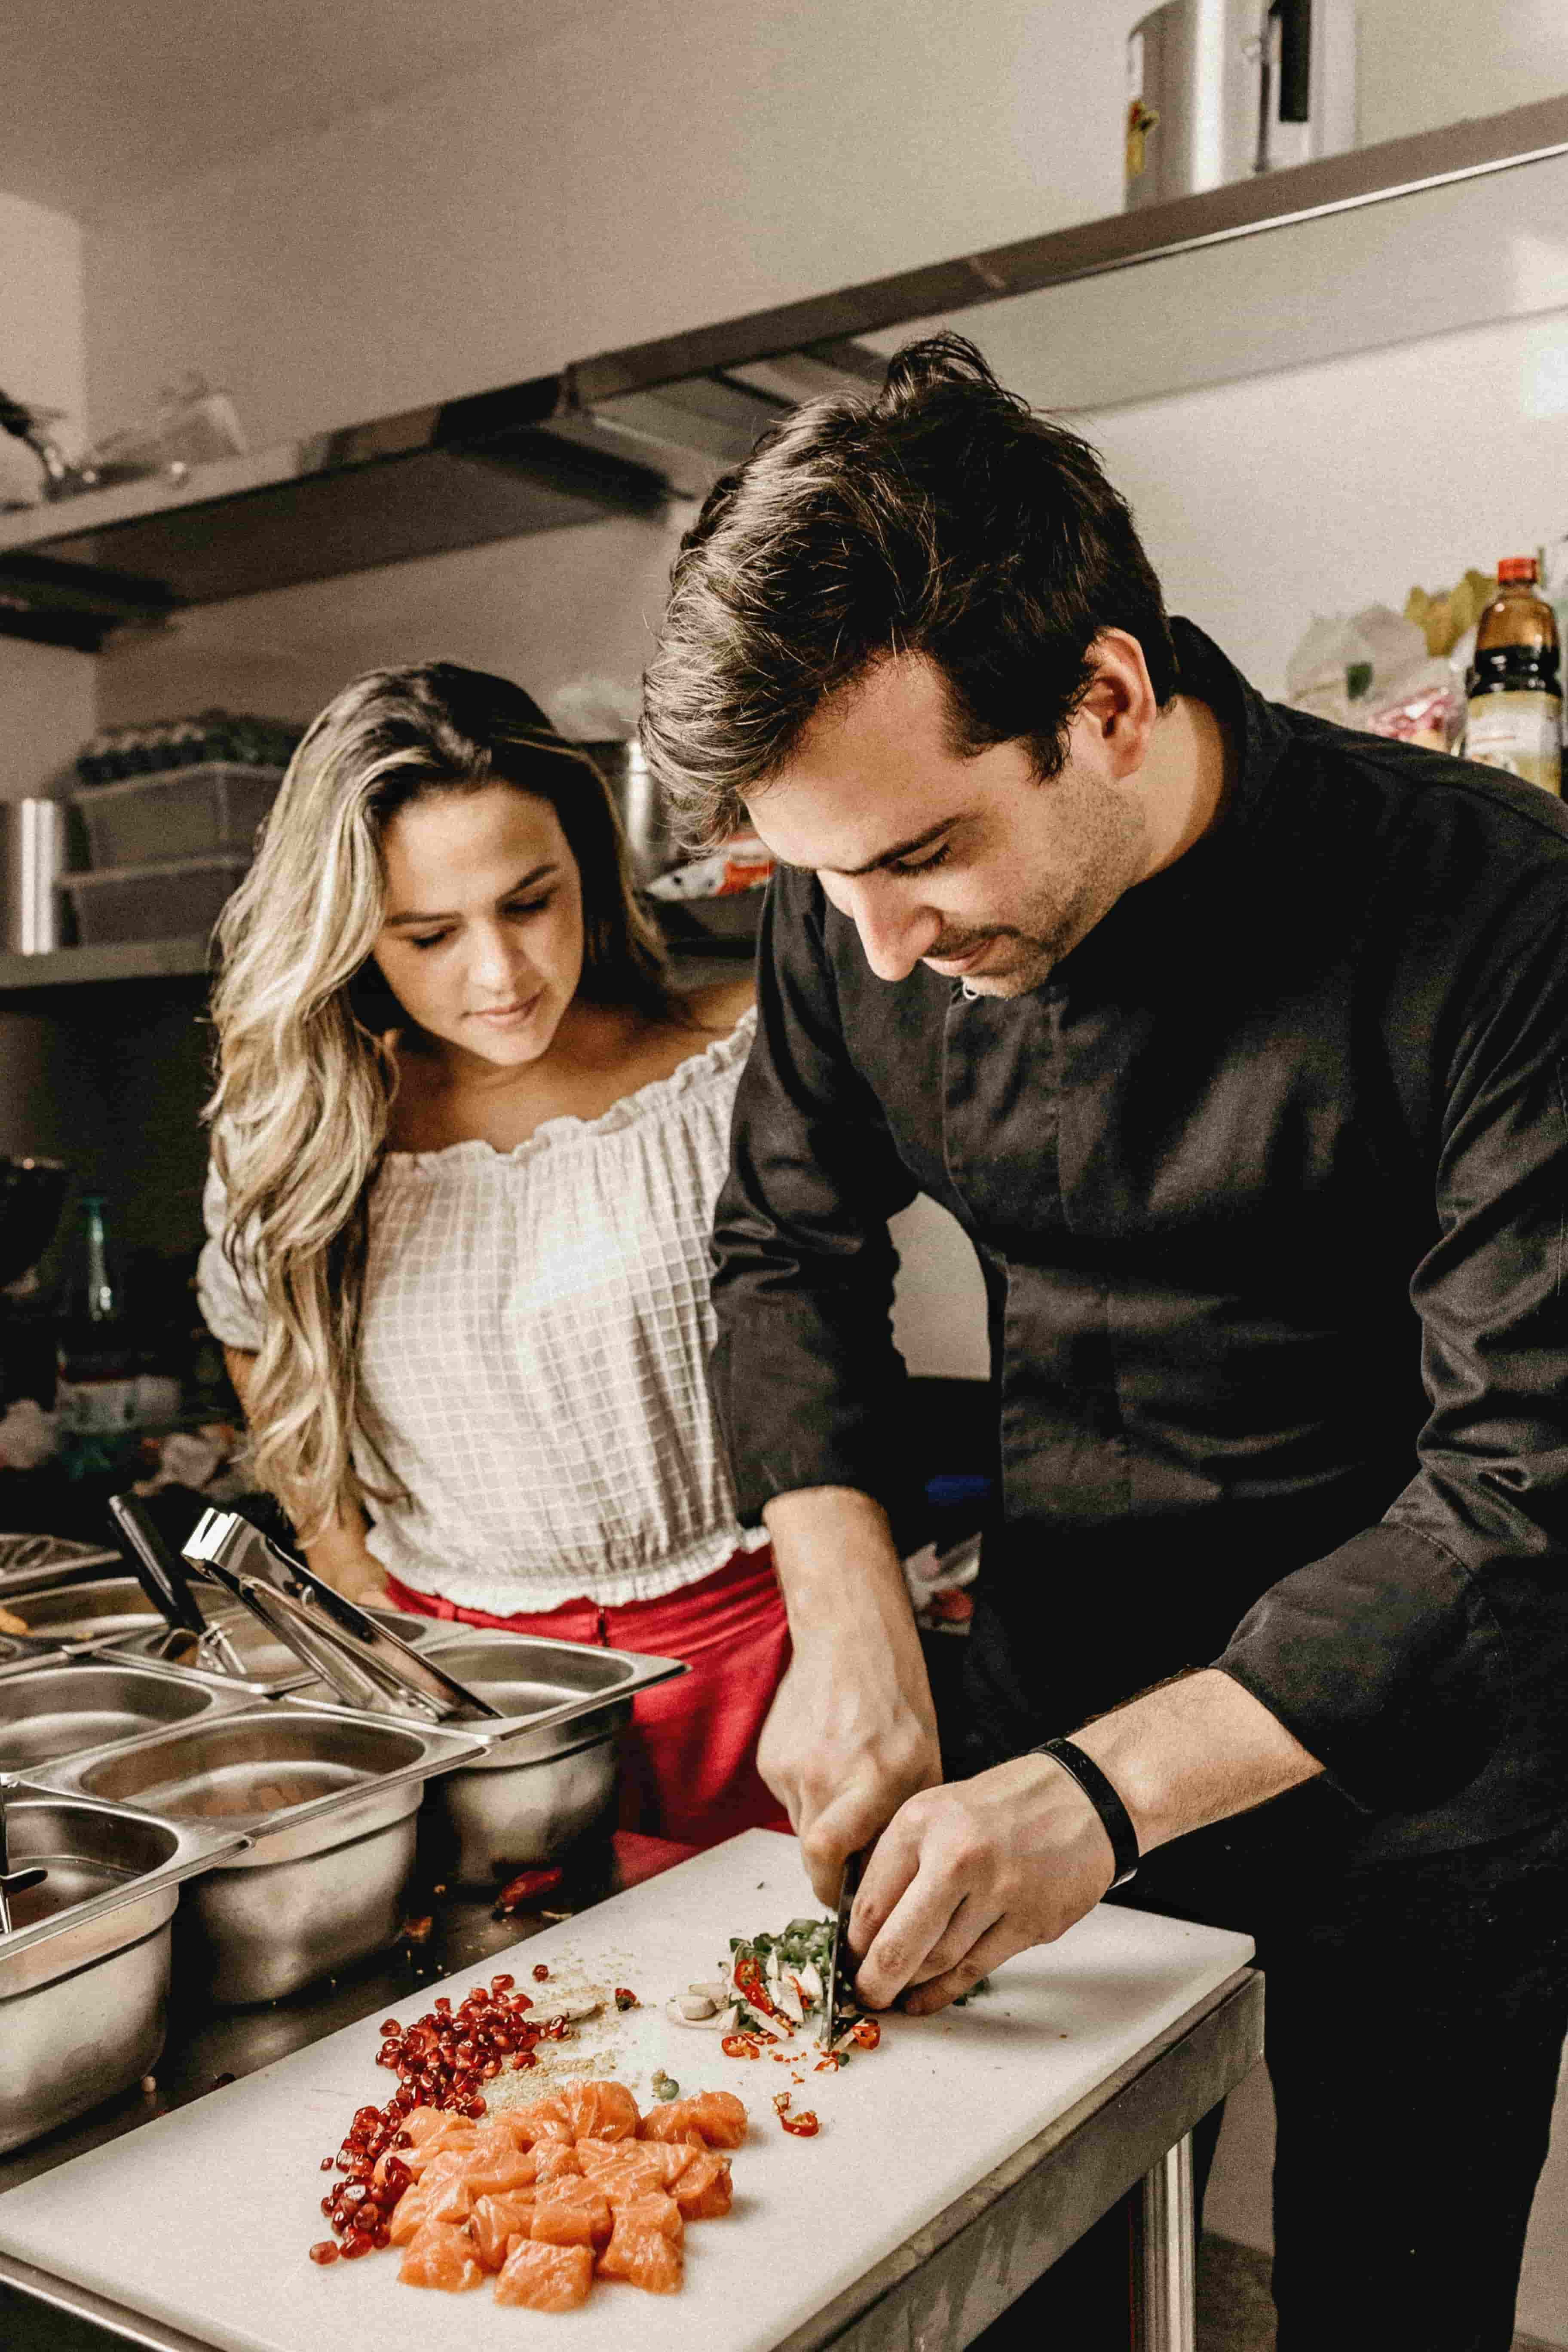 Date Night: Elegant Italian for Couples